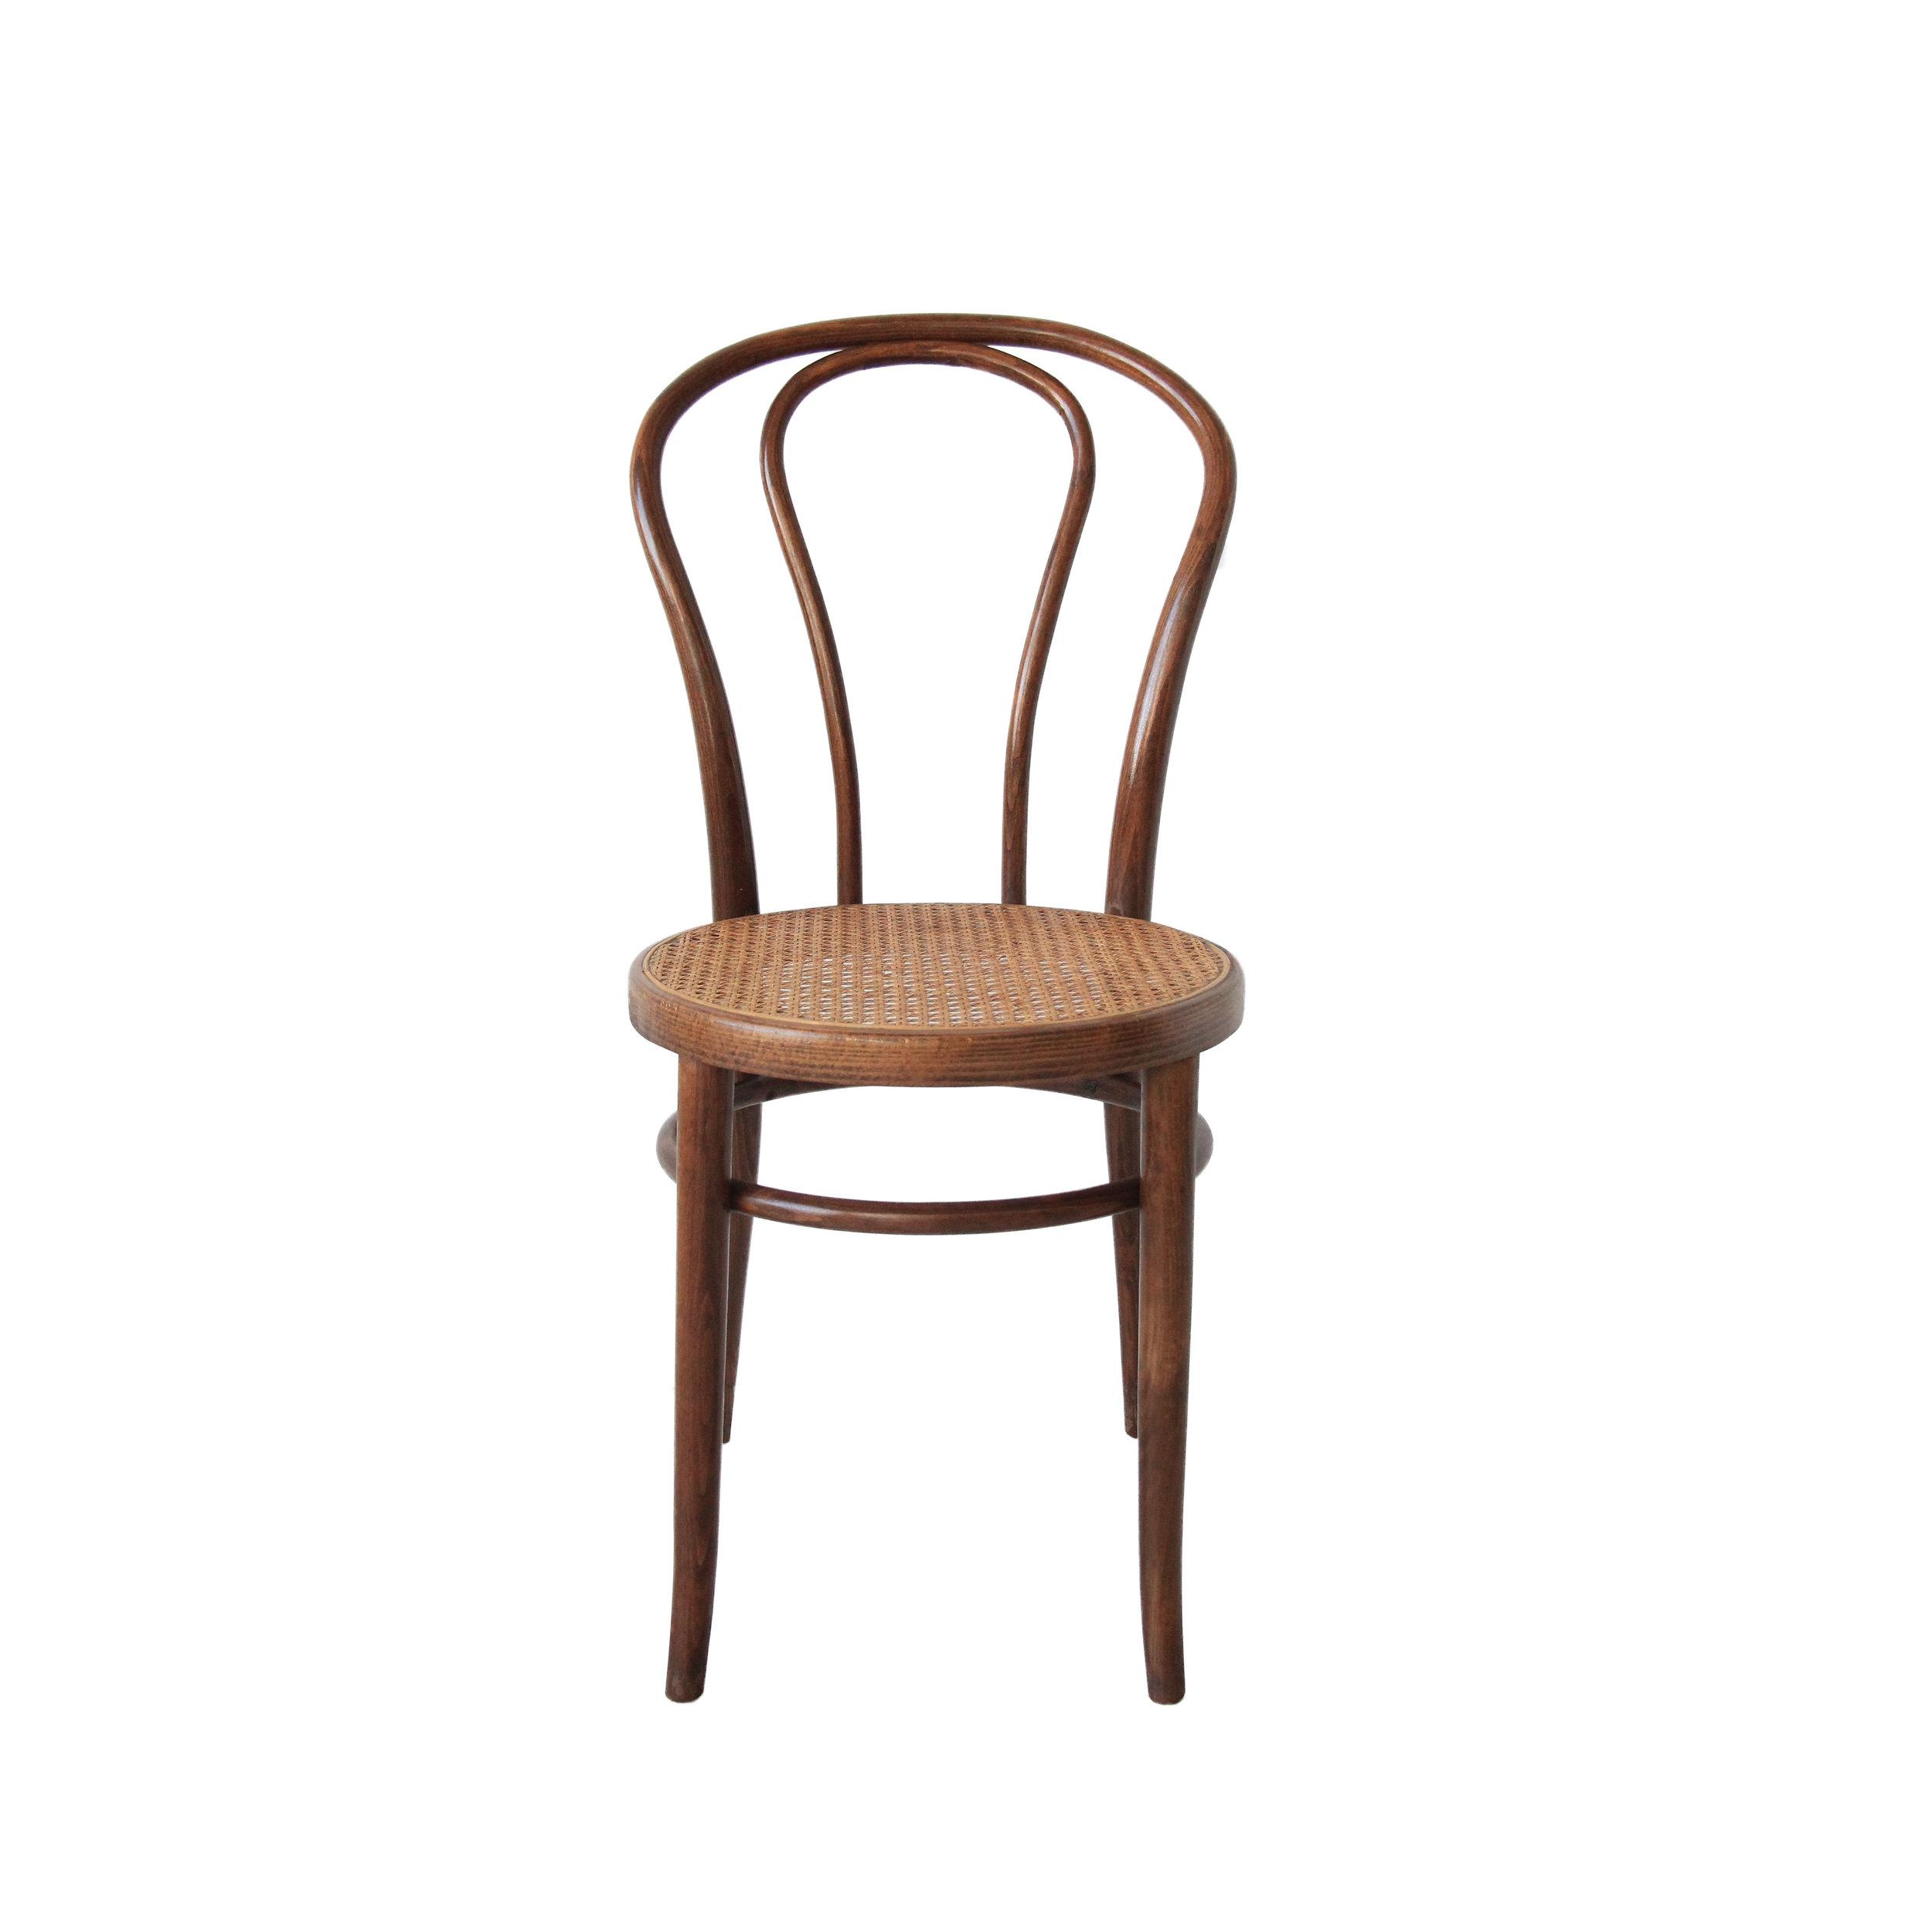 Vintage Thonet Bentwood Bistro Chair